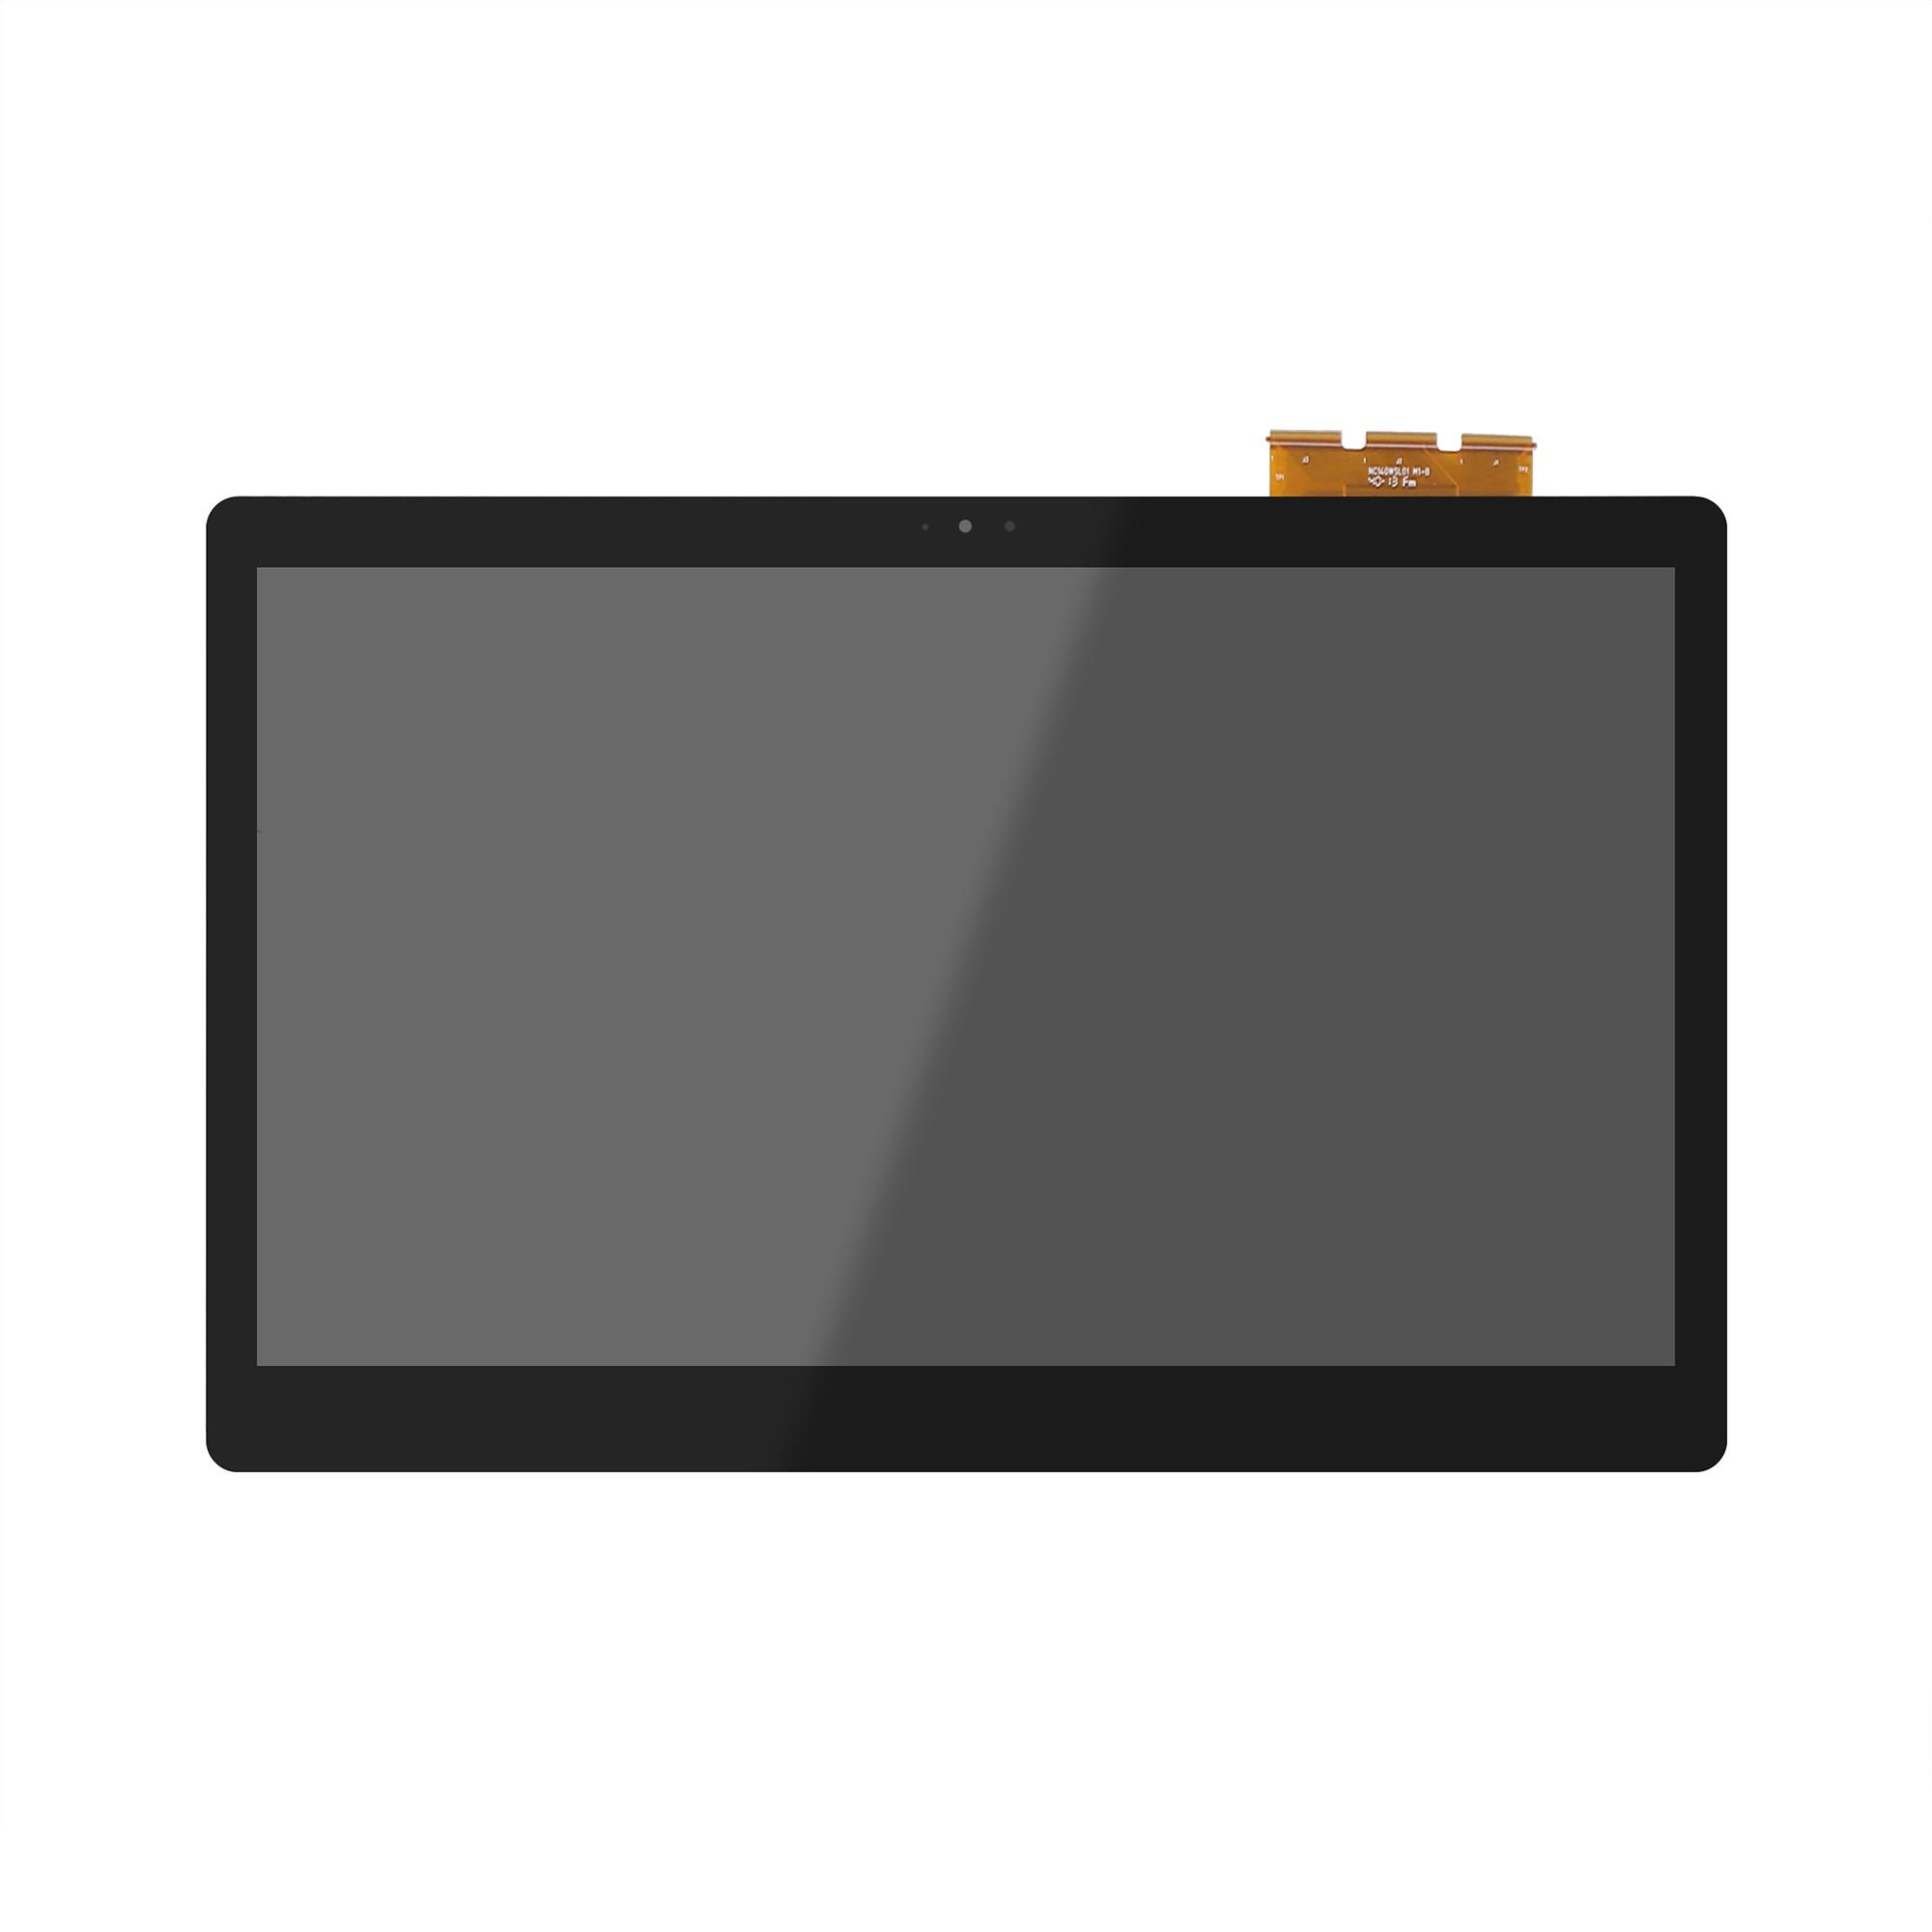 1080P Marke NEUE 14 ZOLL Laptop LCD Display Montage für Sony Vaion Flip SVF14N SVF14N13CXB SVF14N11CXB SVF14N16CXS